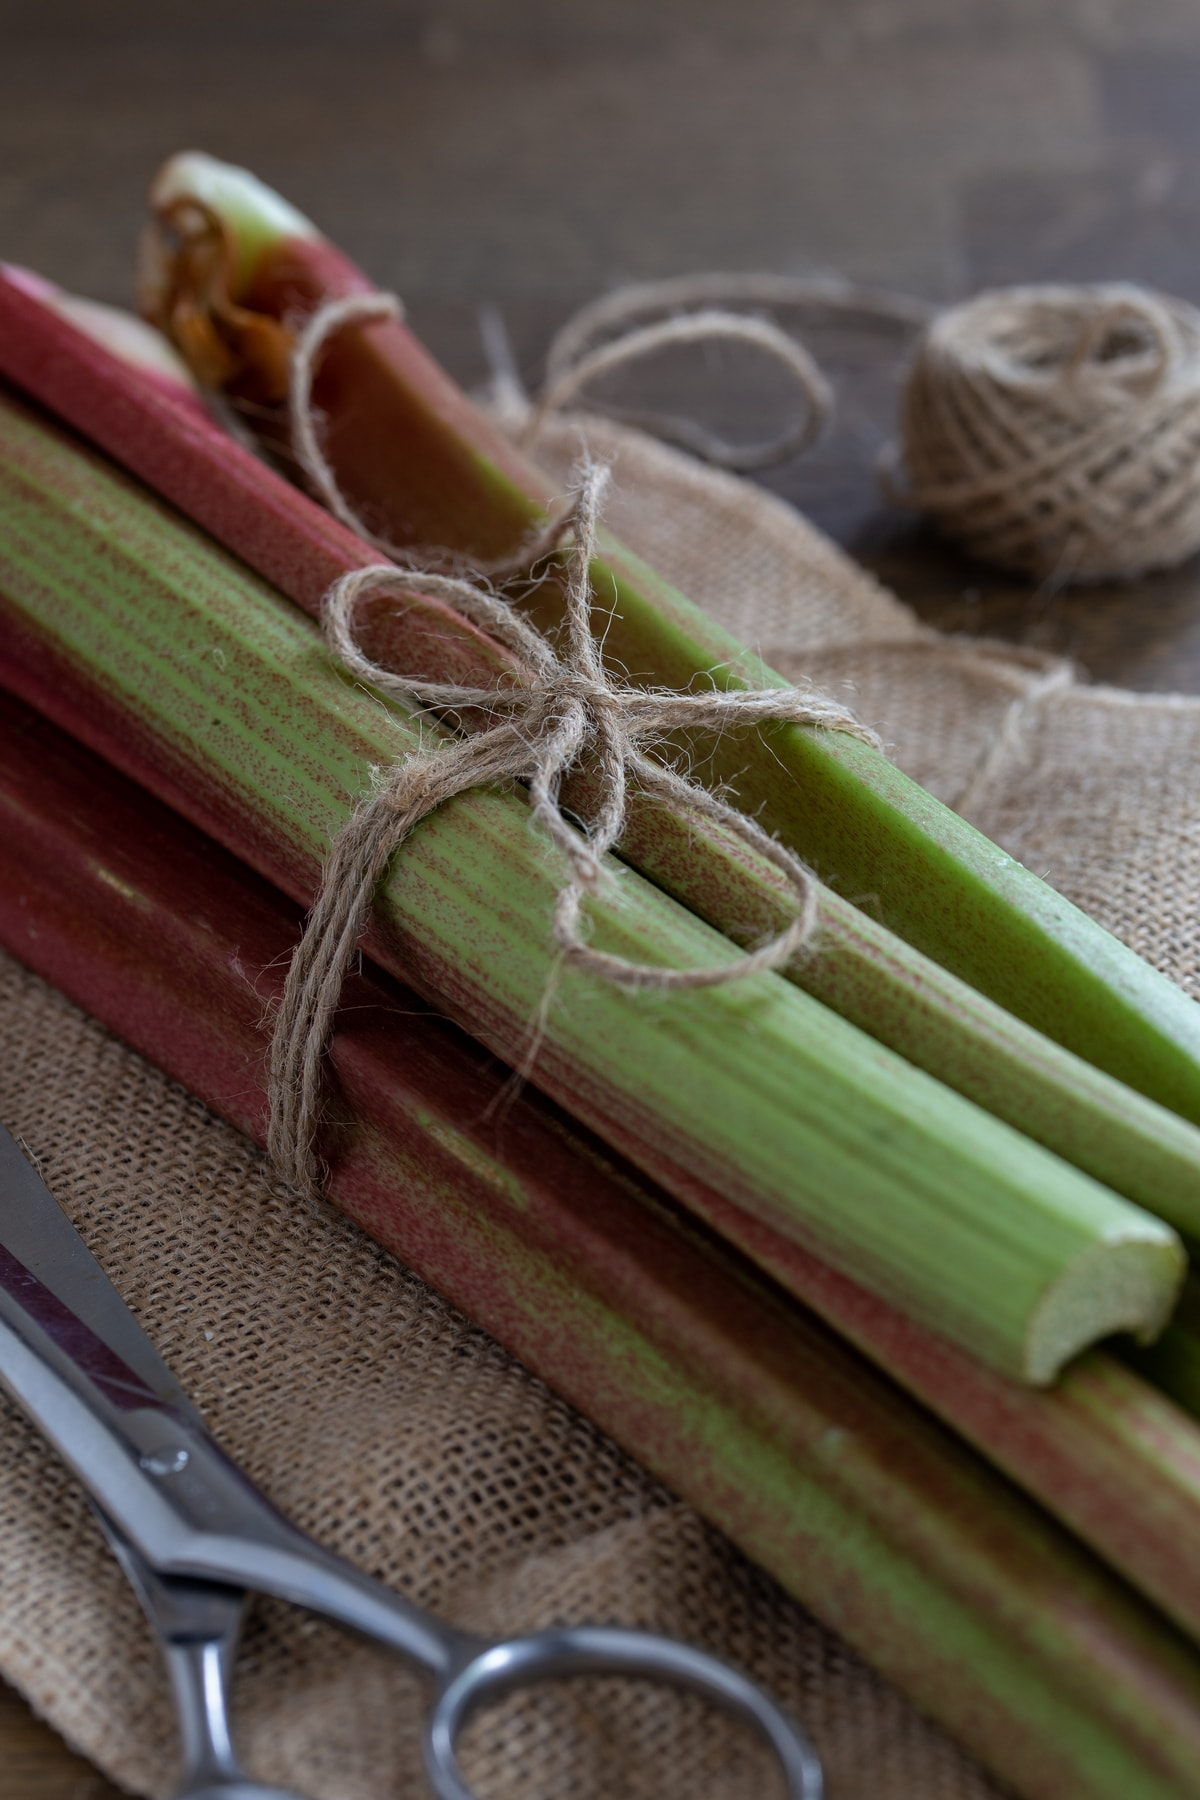 Rhubarb stalks tied with a jute thread.